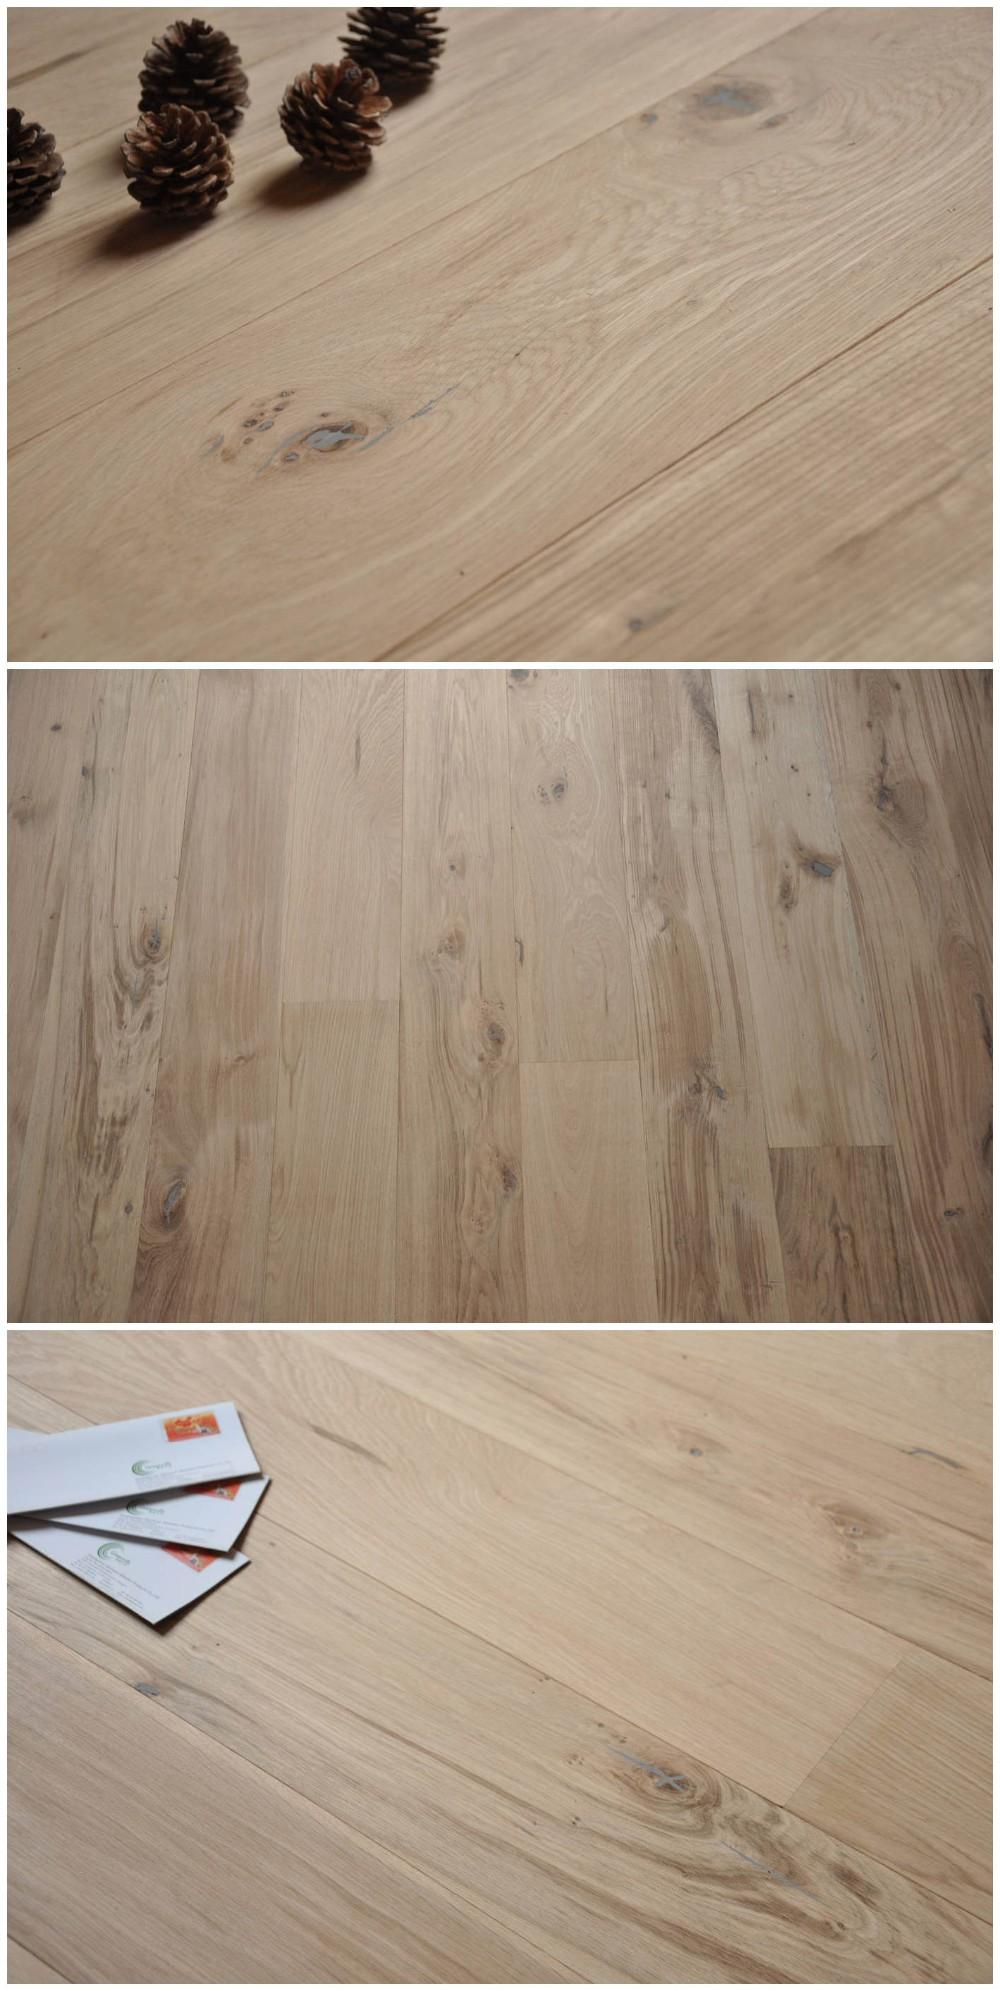 European oak parquet flooring rustic wood floor tile buy rustic european oak parquet flooring rustic wood floor tile dailygadgetfo Image collections